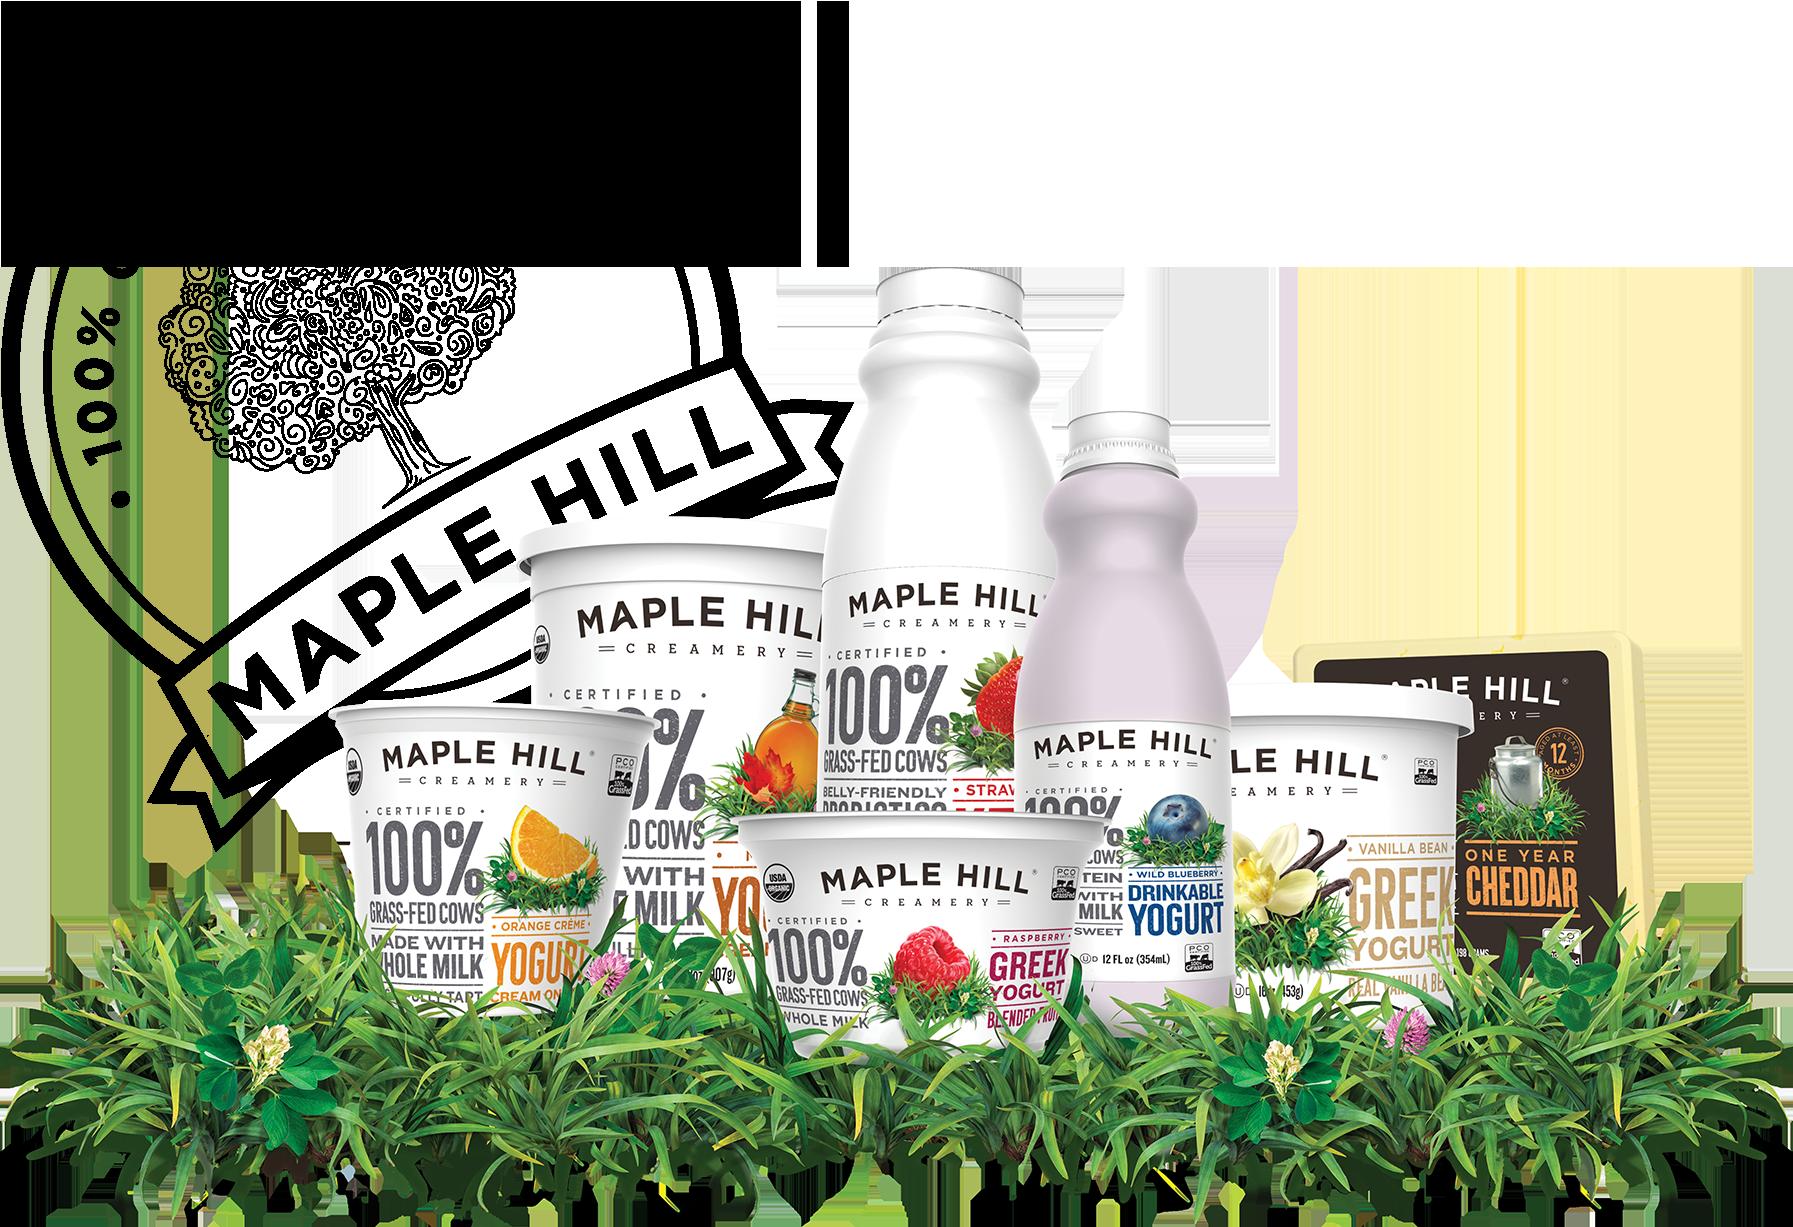 Products Alternative Grass Fed Dairy Grass Fed Milk Drinkable Yogurt